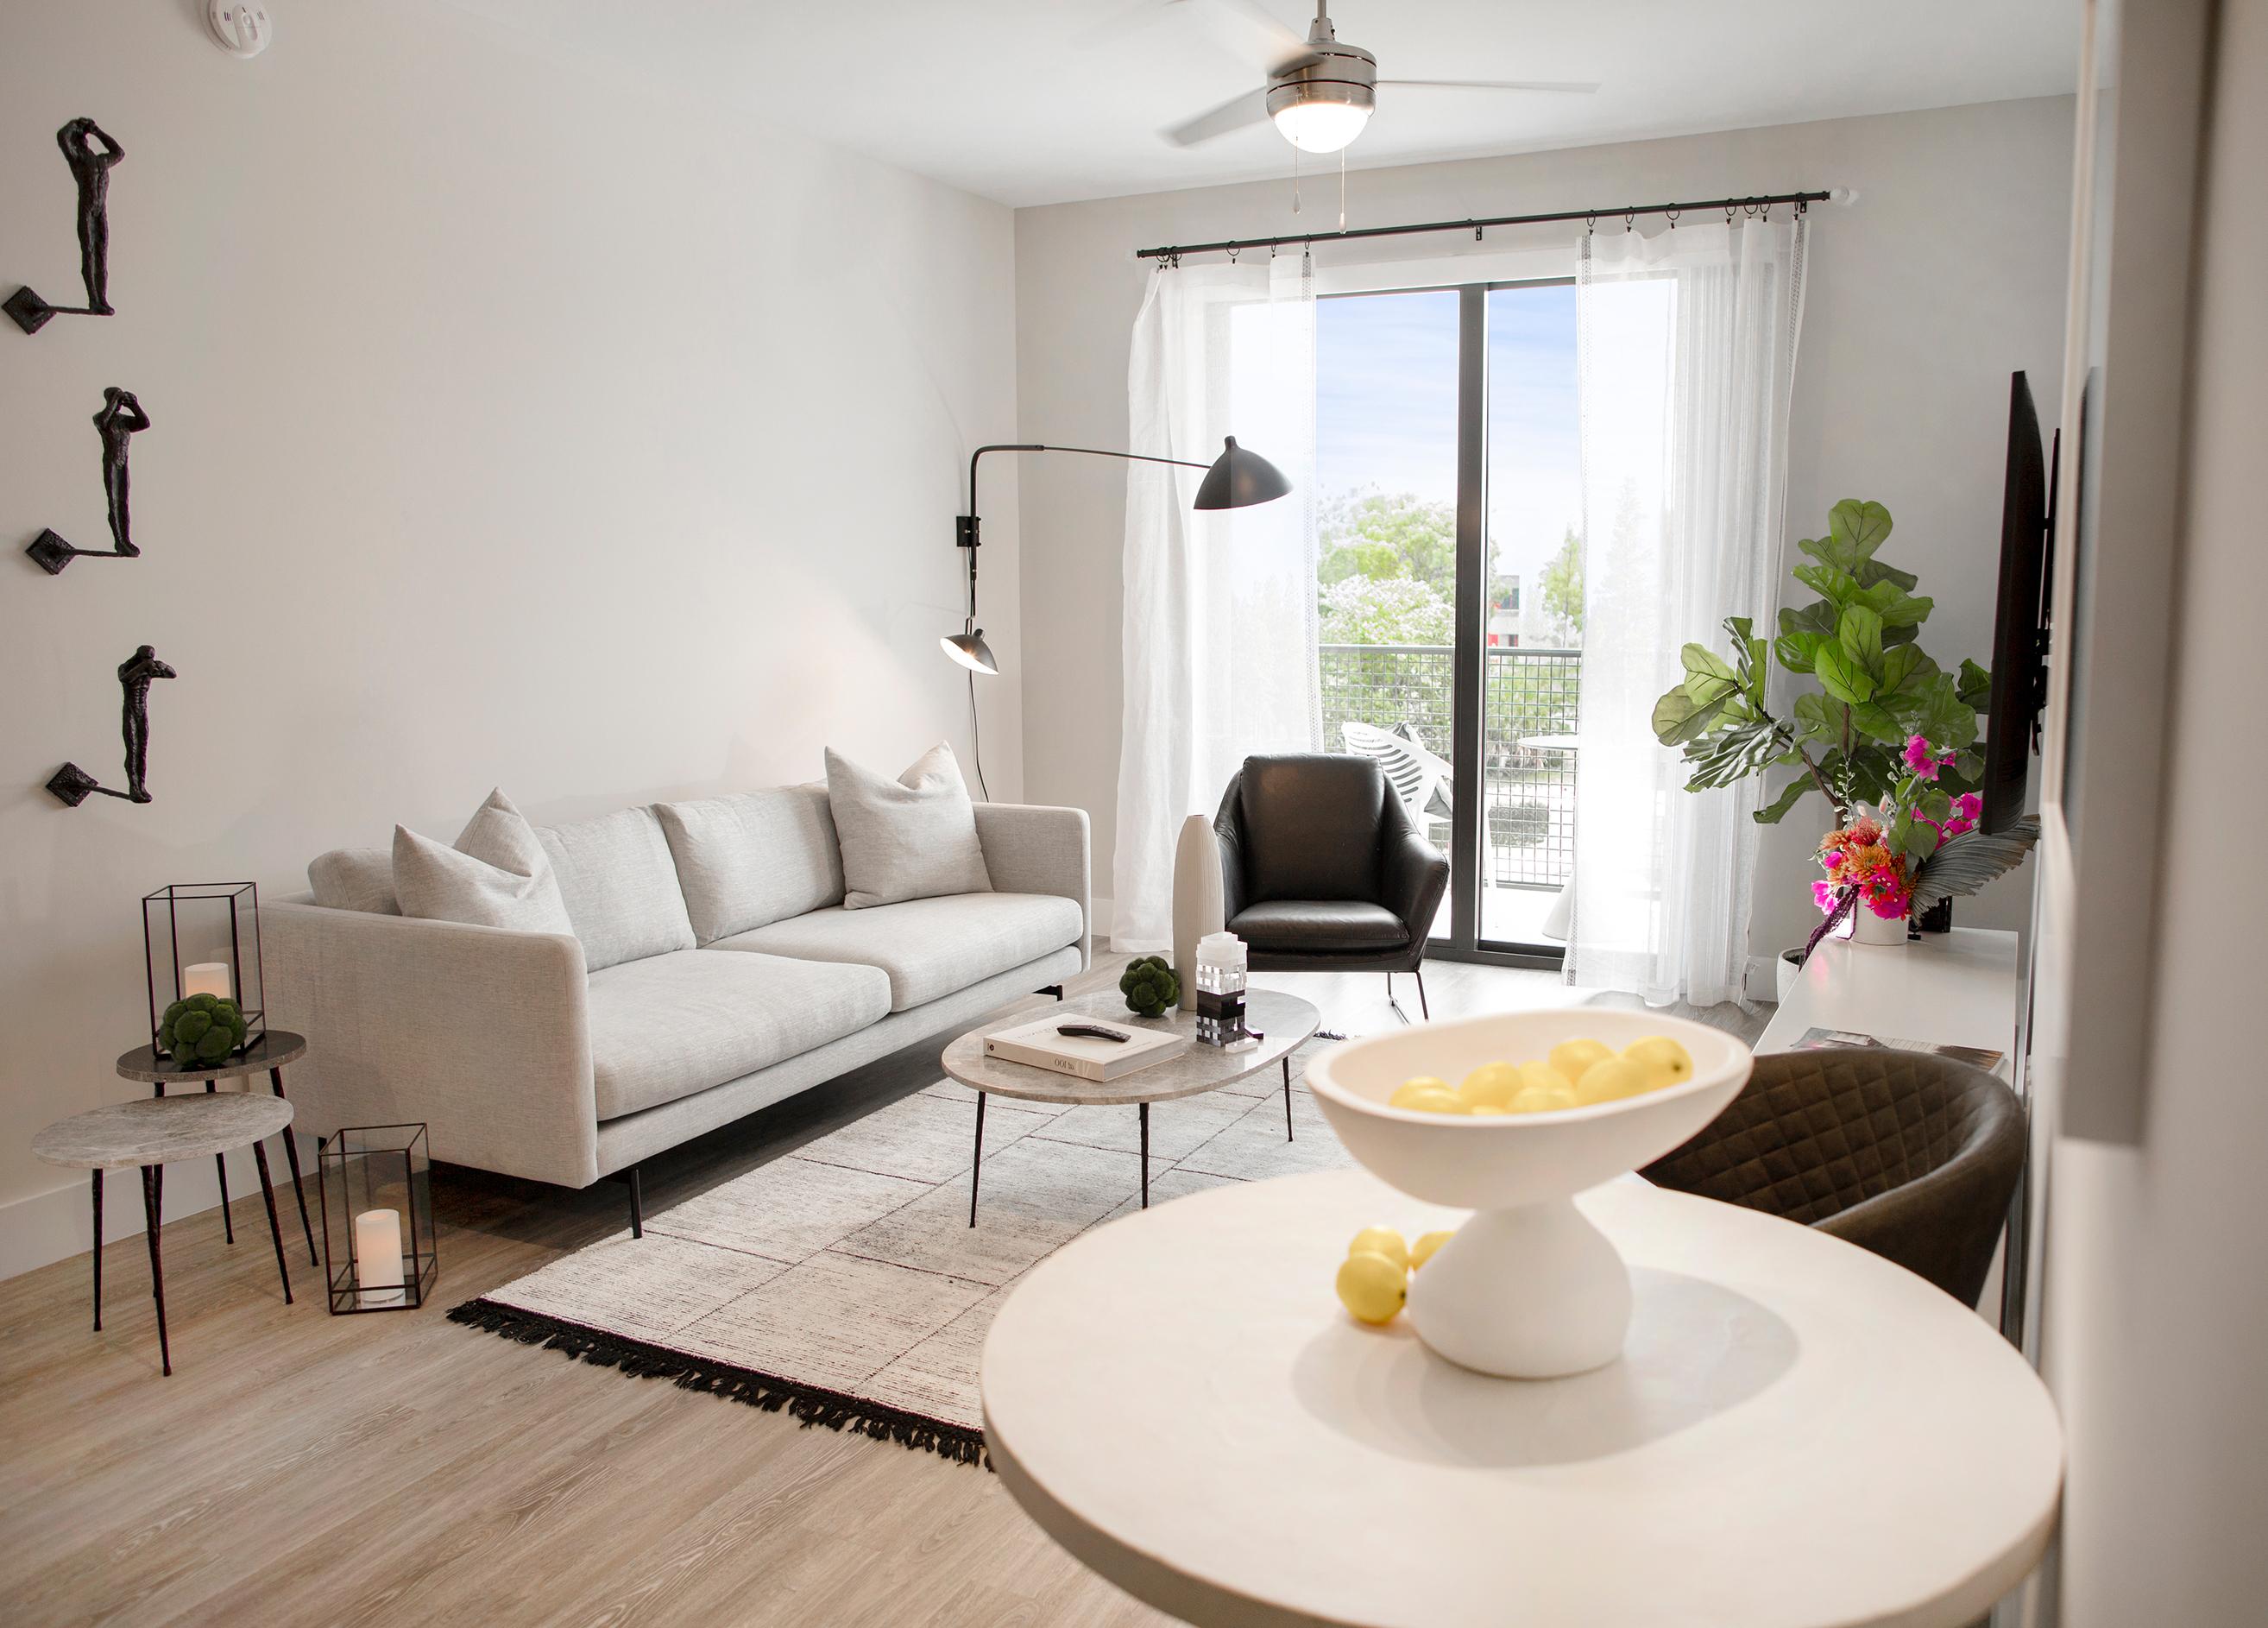 Sanctuary Doral living room